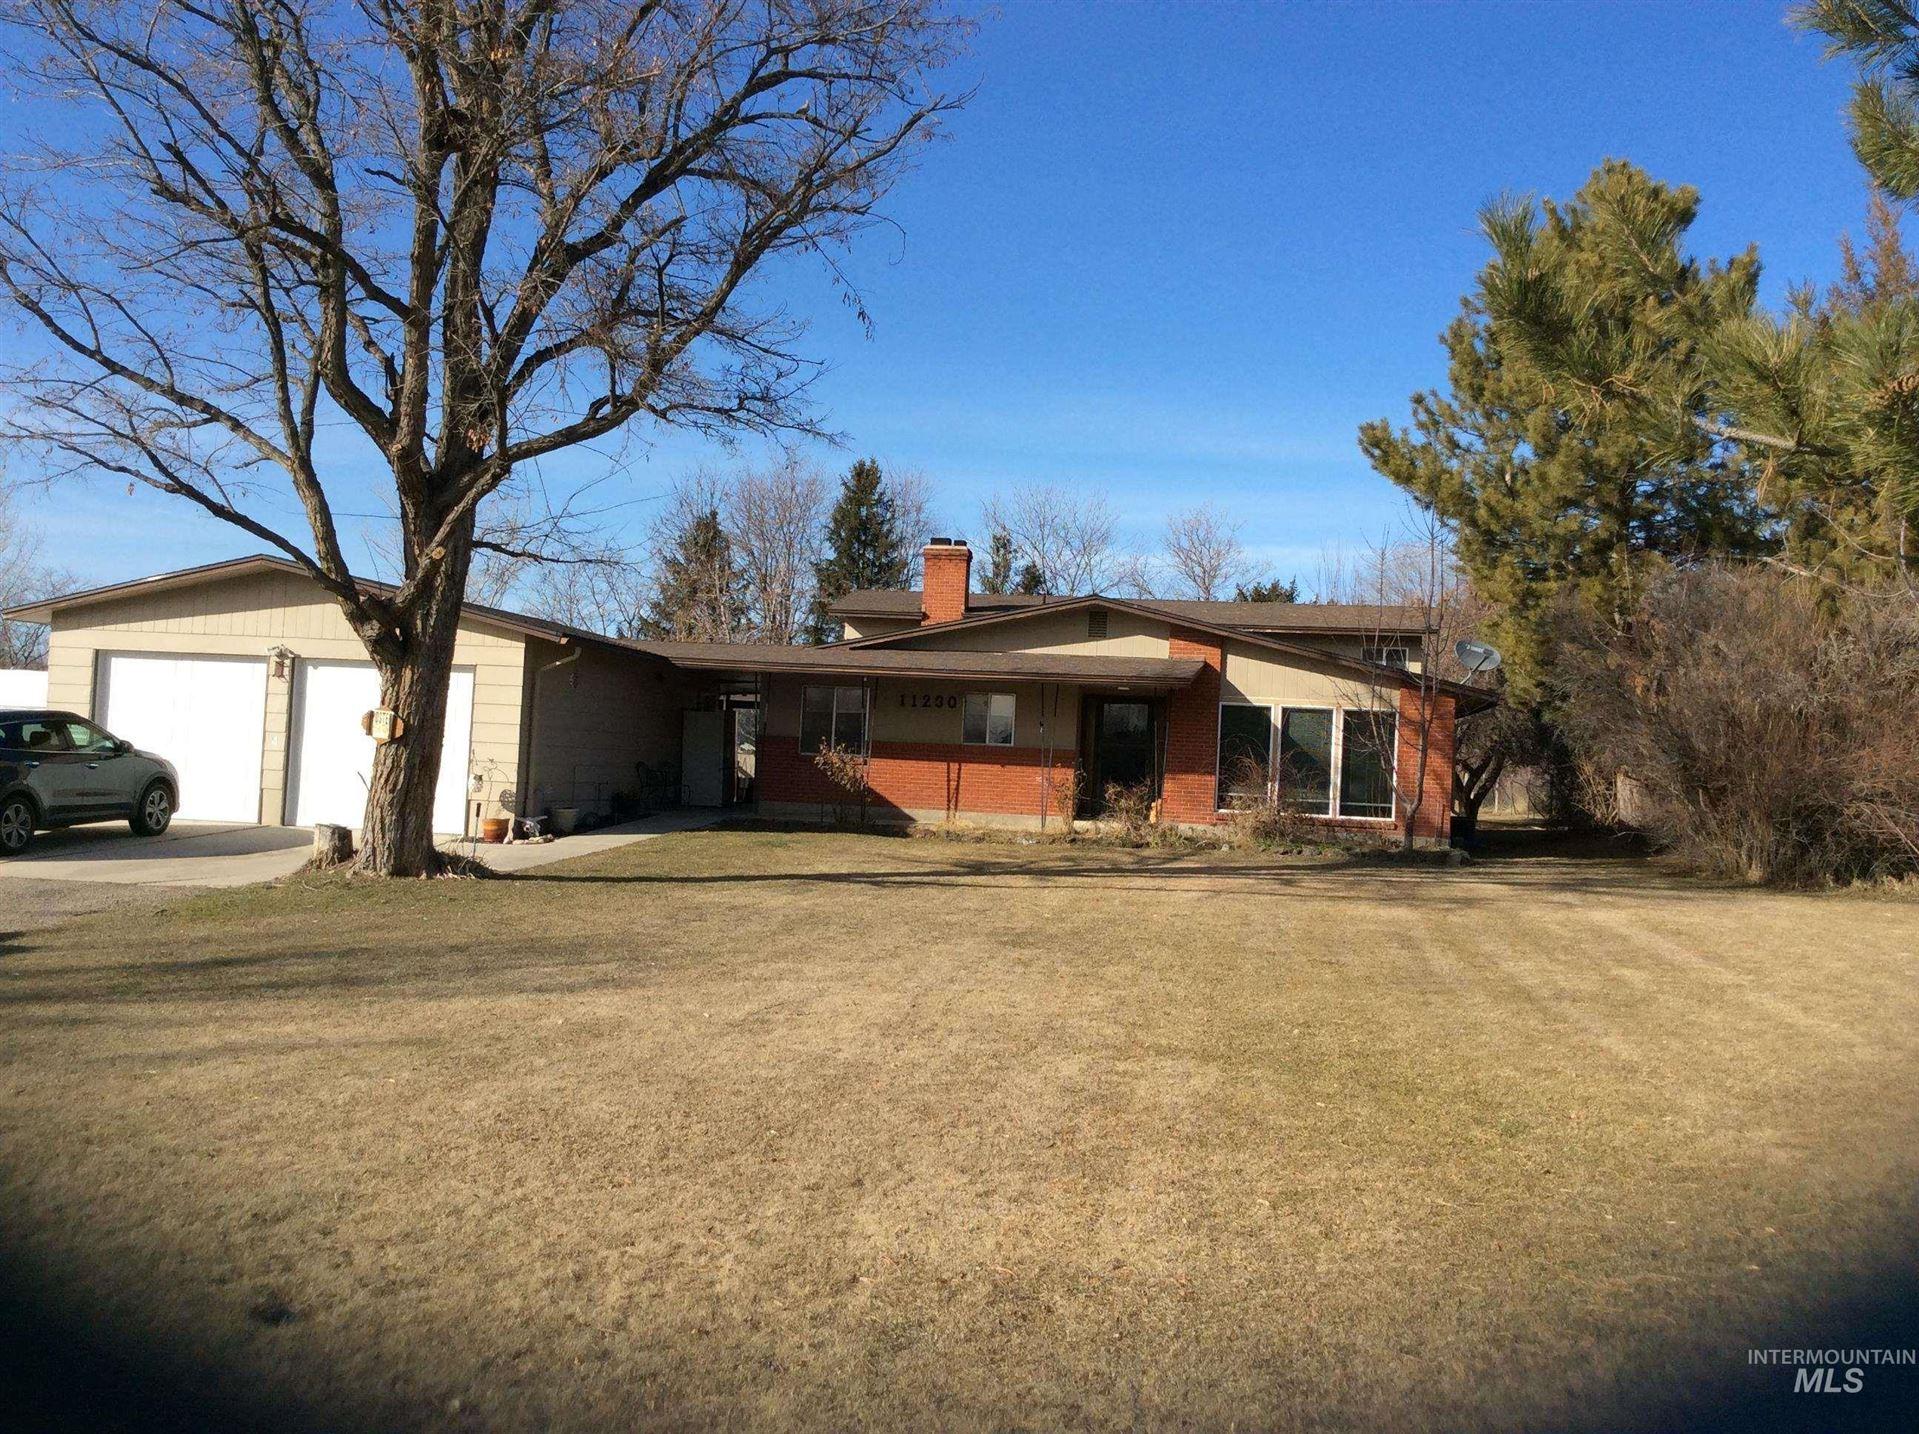 11230 W Amity, Boise, ID 83709 - MLS#: 98819071